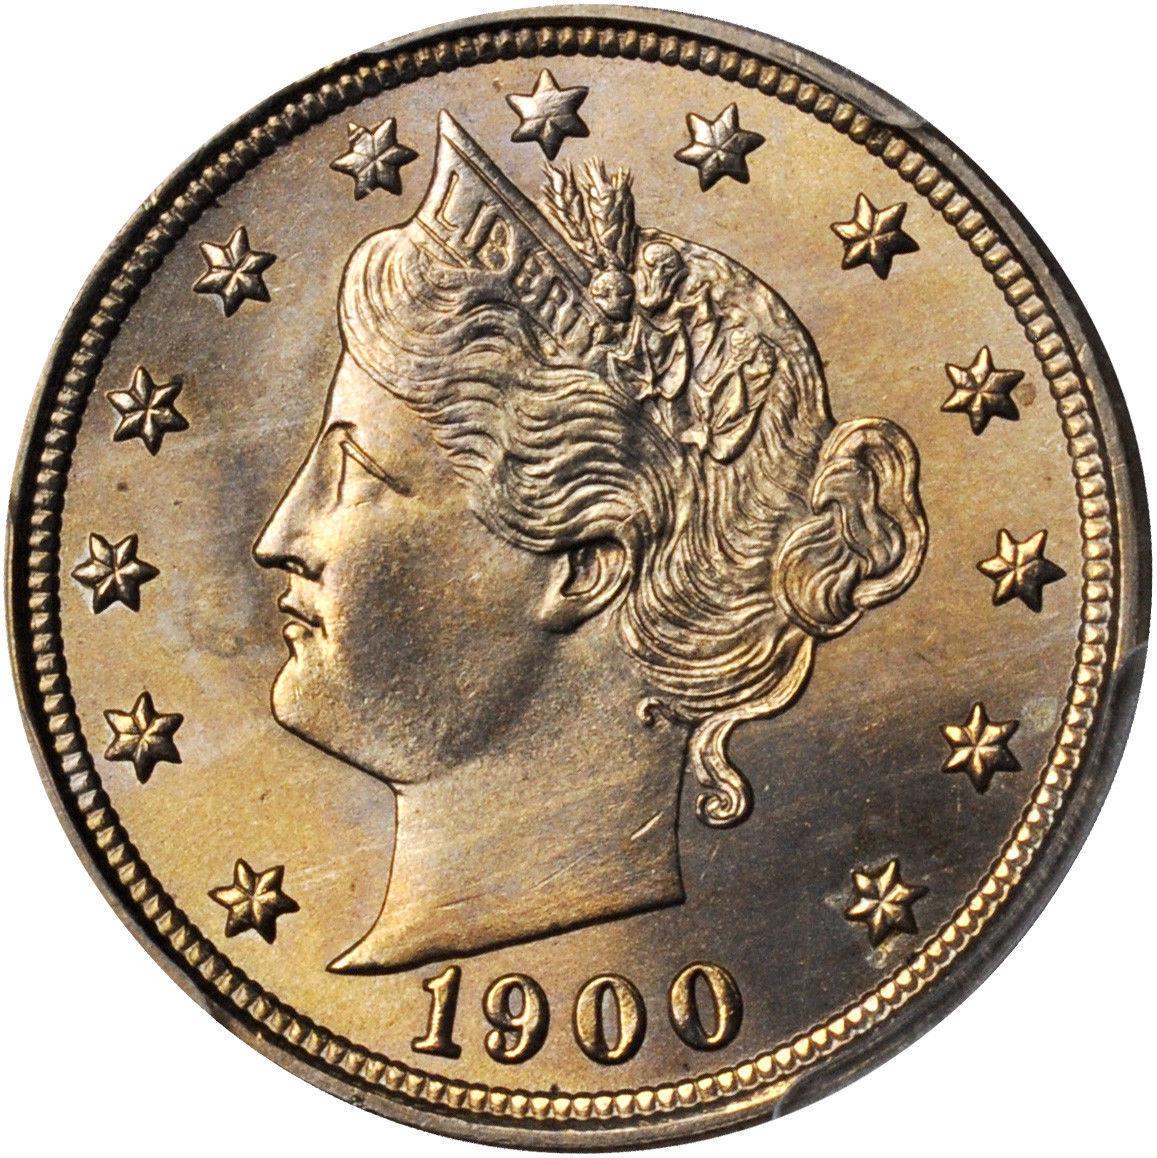 1900 Liberty Head Nickel - PCGS MS-66  - Mint State 66 - V Nickel